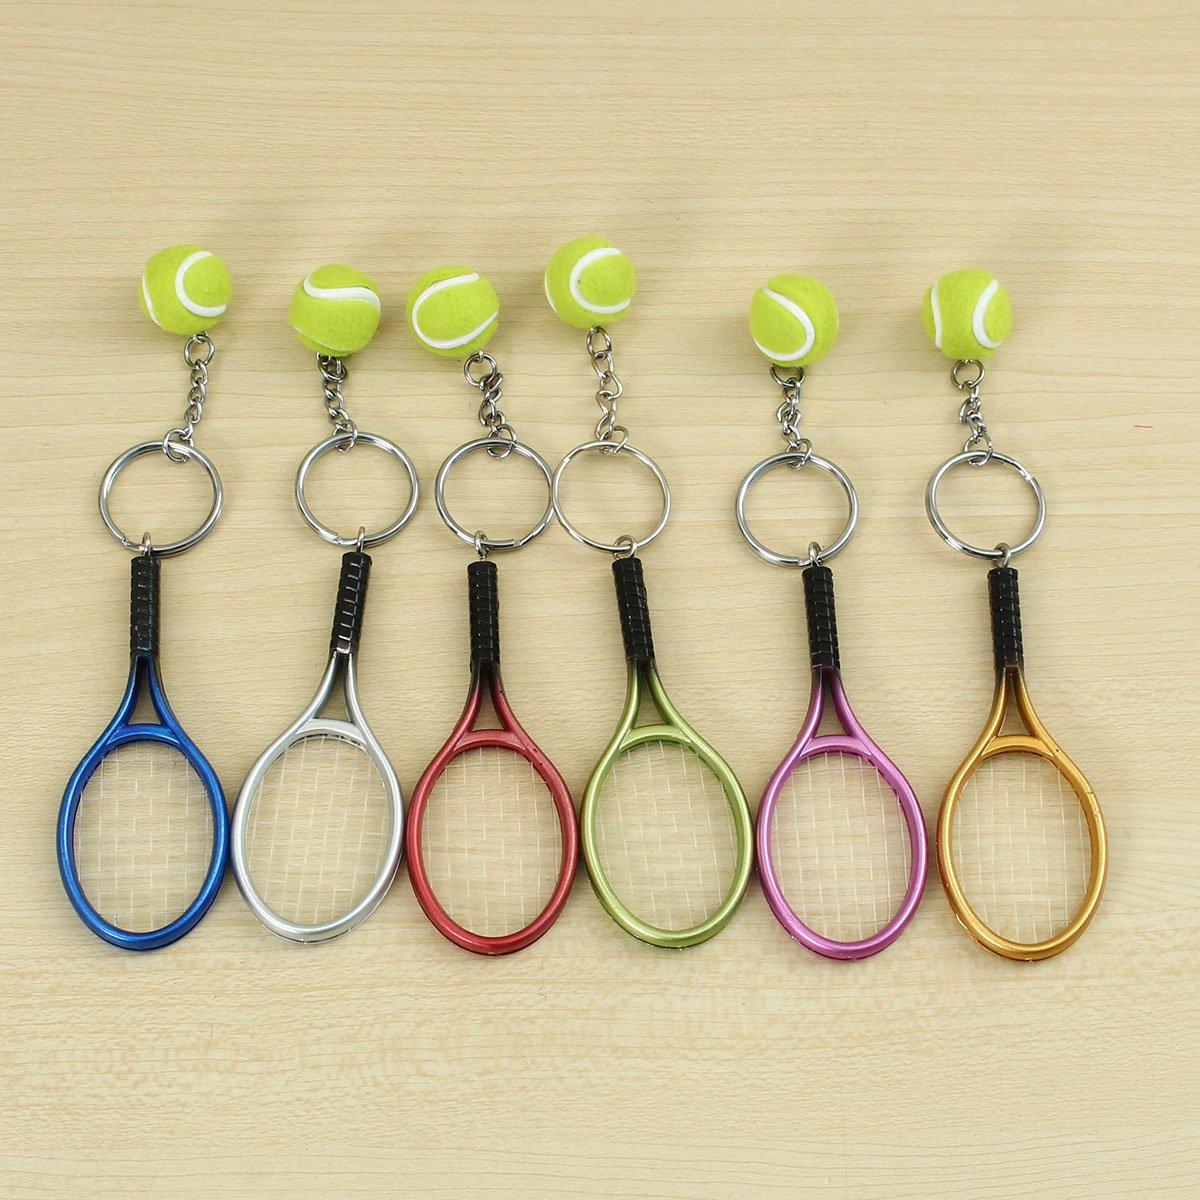 KUNSE Sport Tenis Pelota Raqueta Llavero Coleccionable ...